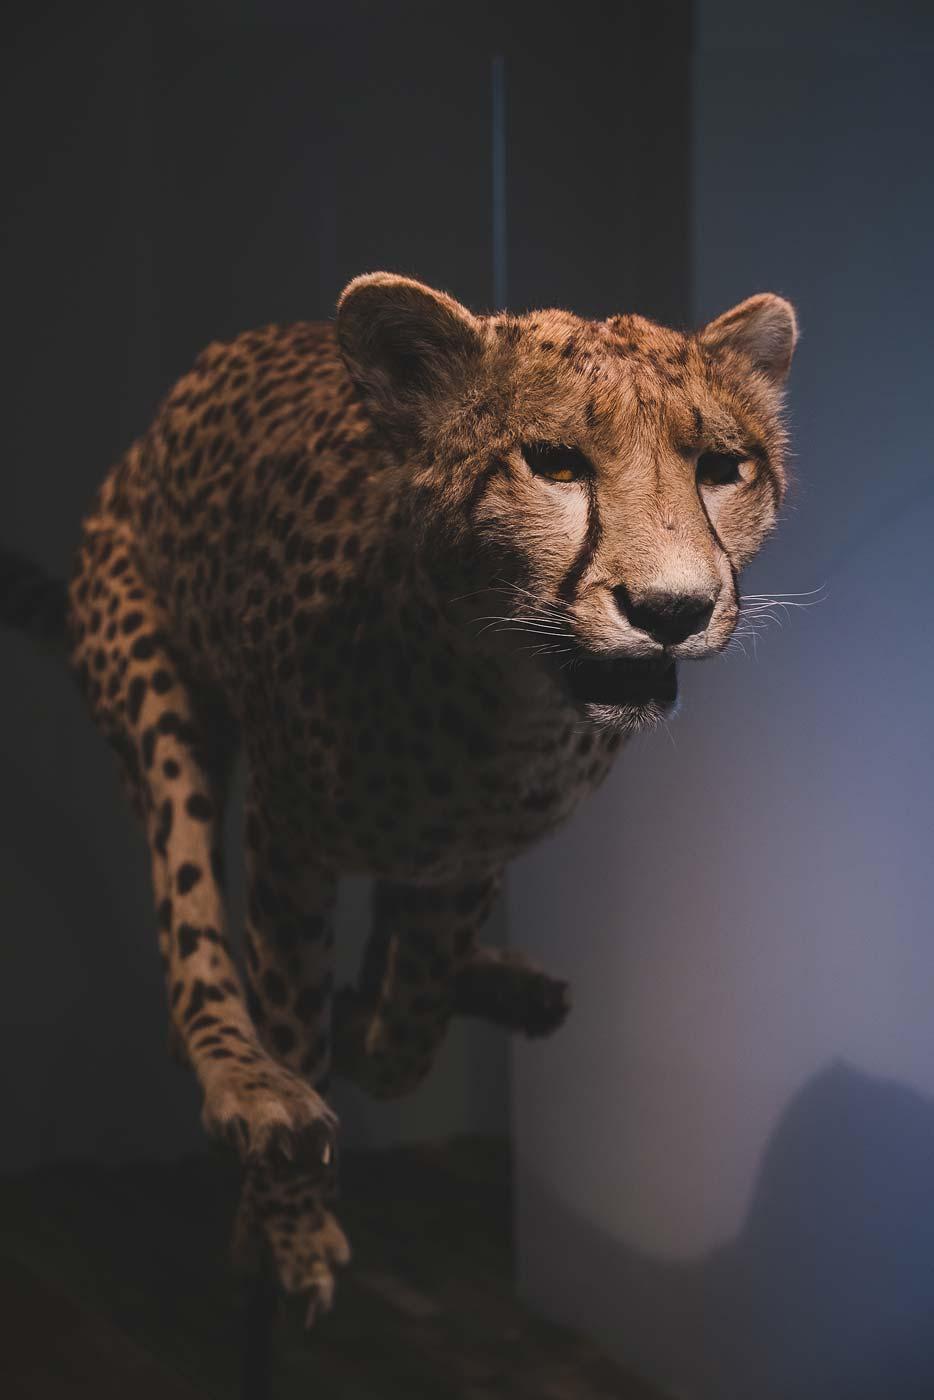 sNatural-History-Museum---Feb-2017-90.jpg